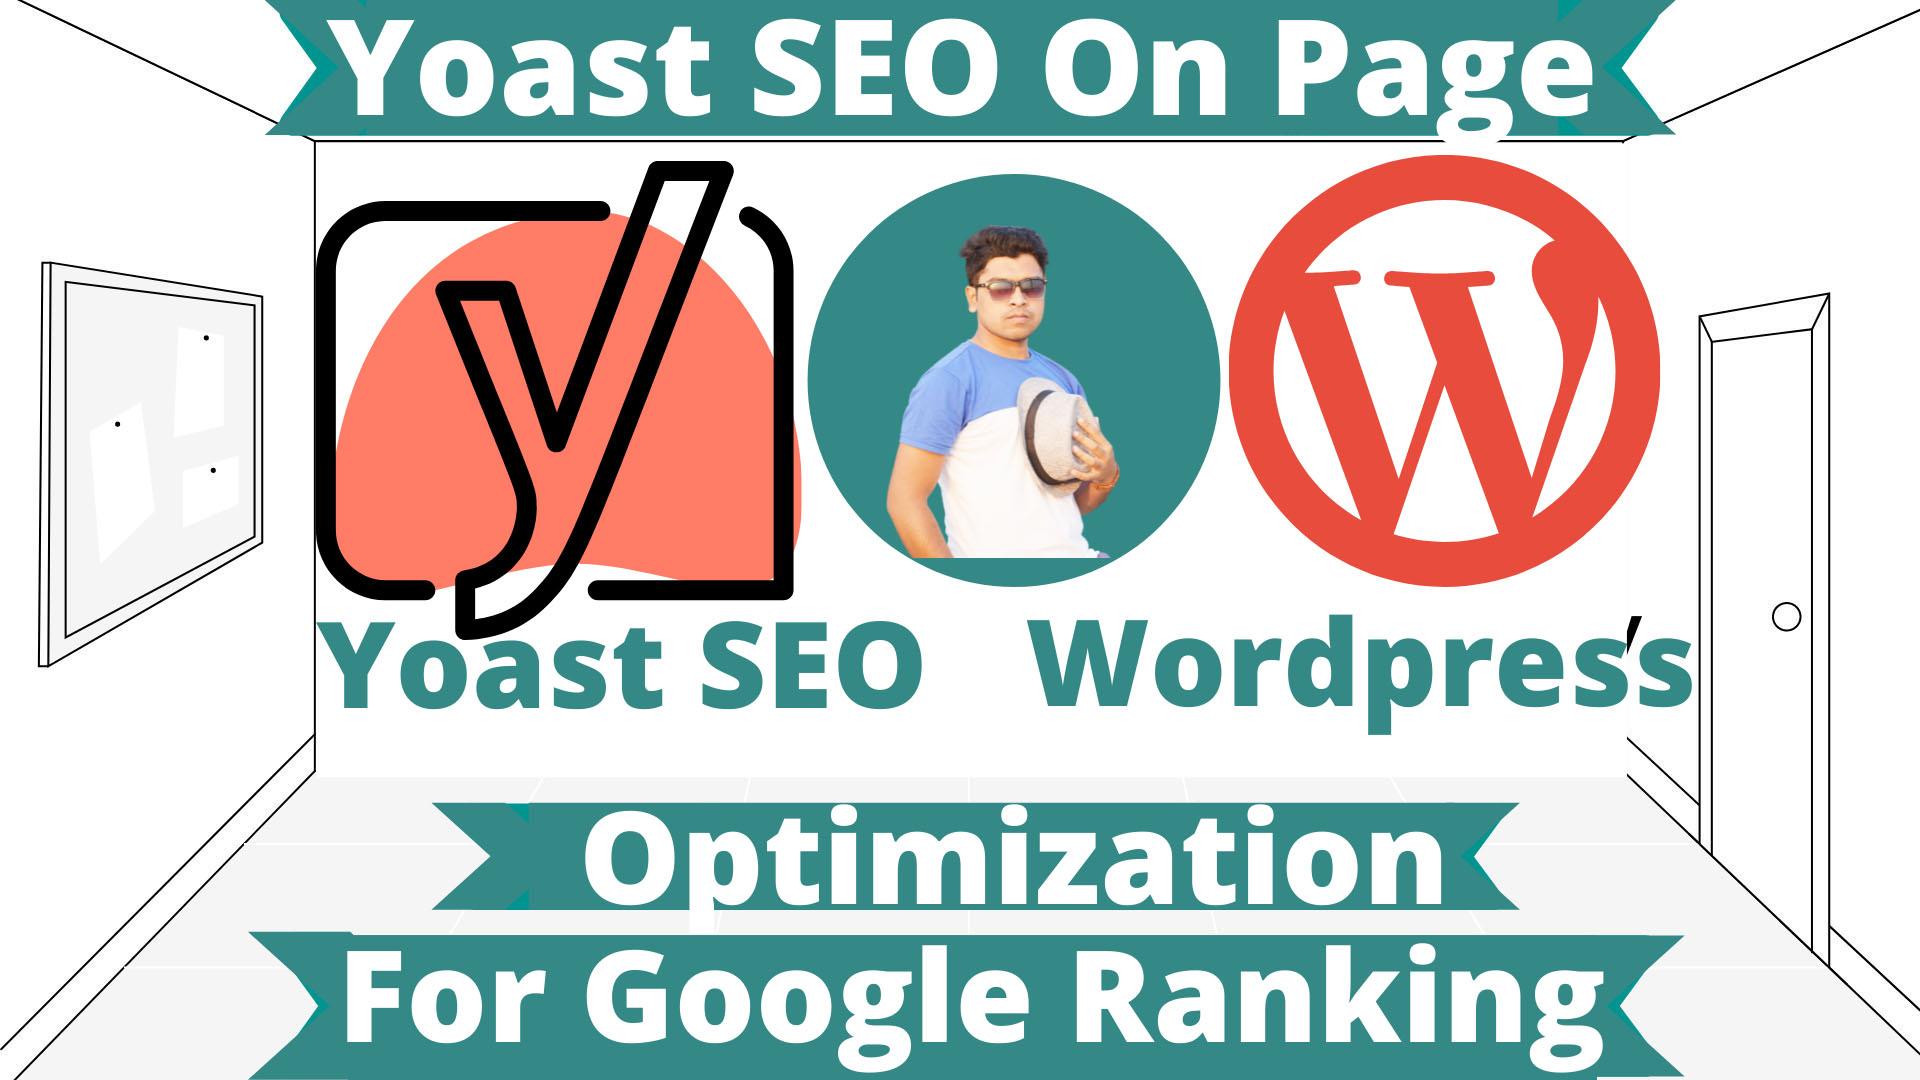 I will do WordPress Yoast SEO on page optimization for google ranking